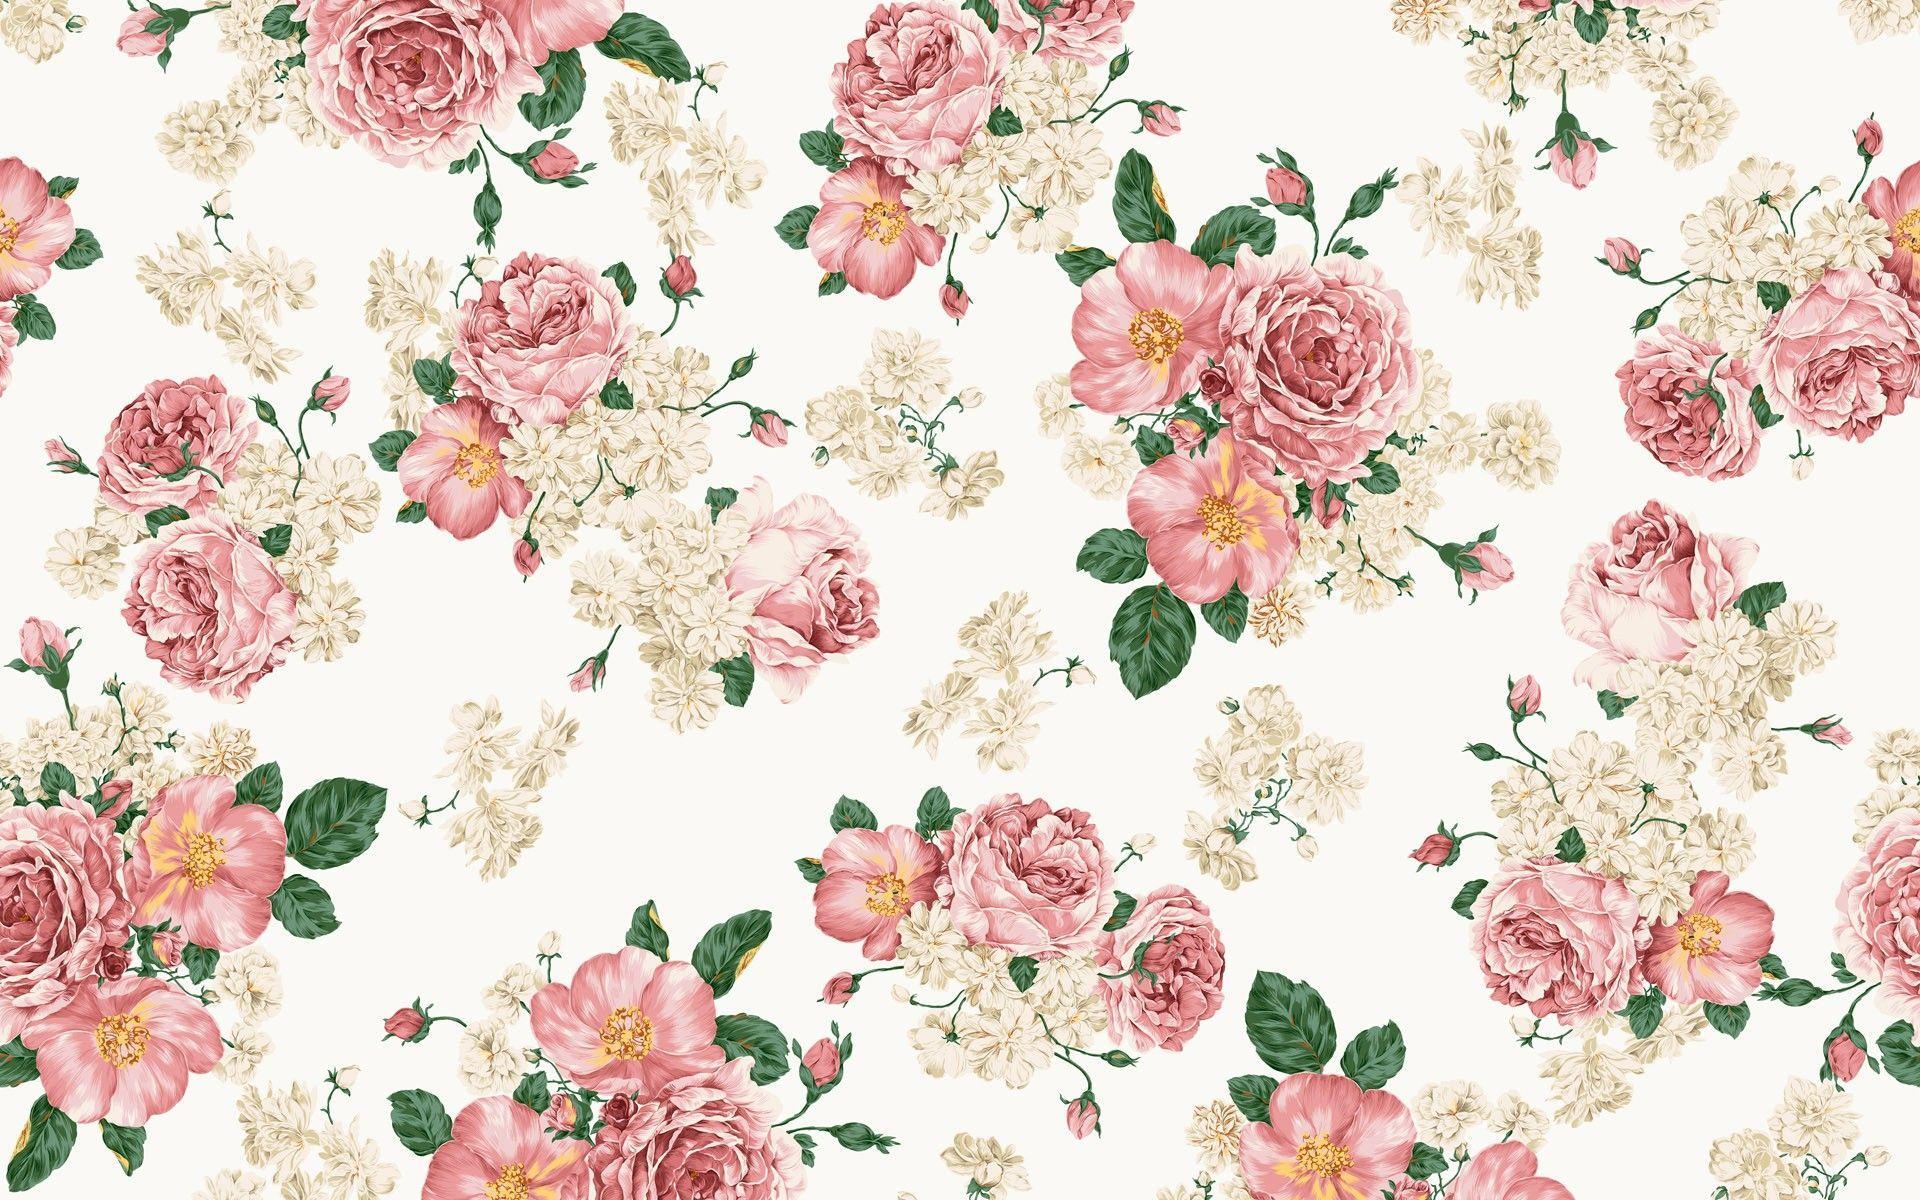 Image of: Pretty Flower Wallpaper Tumblr Flowers Vintage Wallpaper Cave Backgrounds Tumblr Flower Vintage Wallpaper Cave